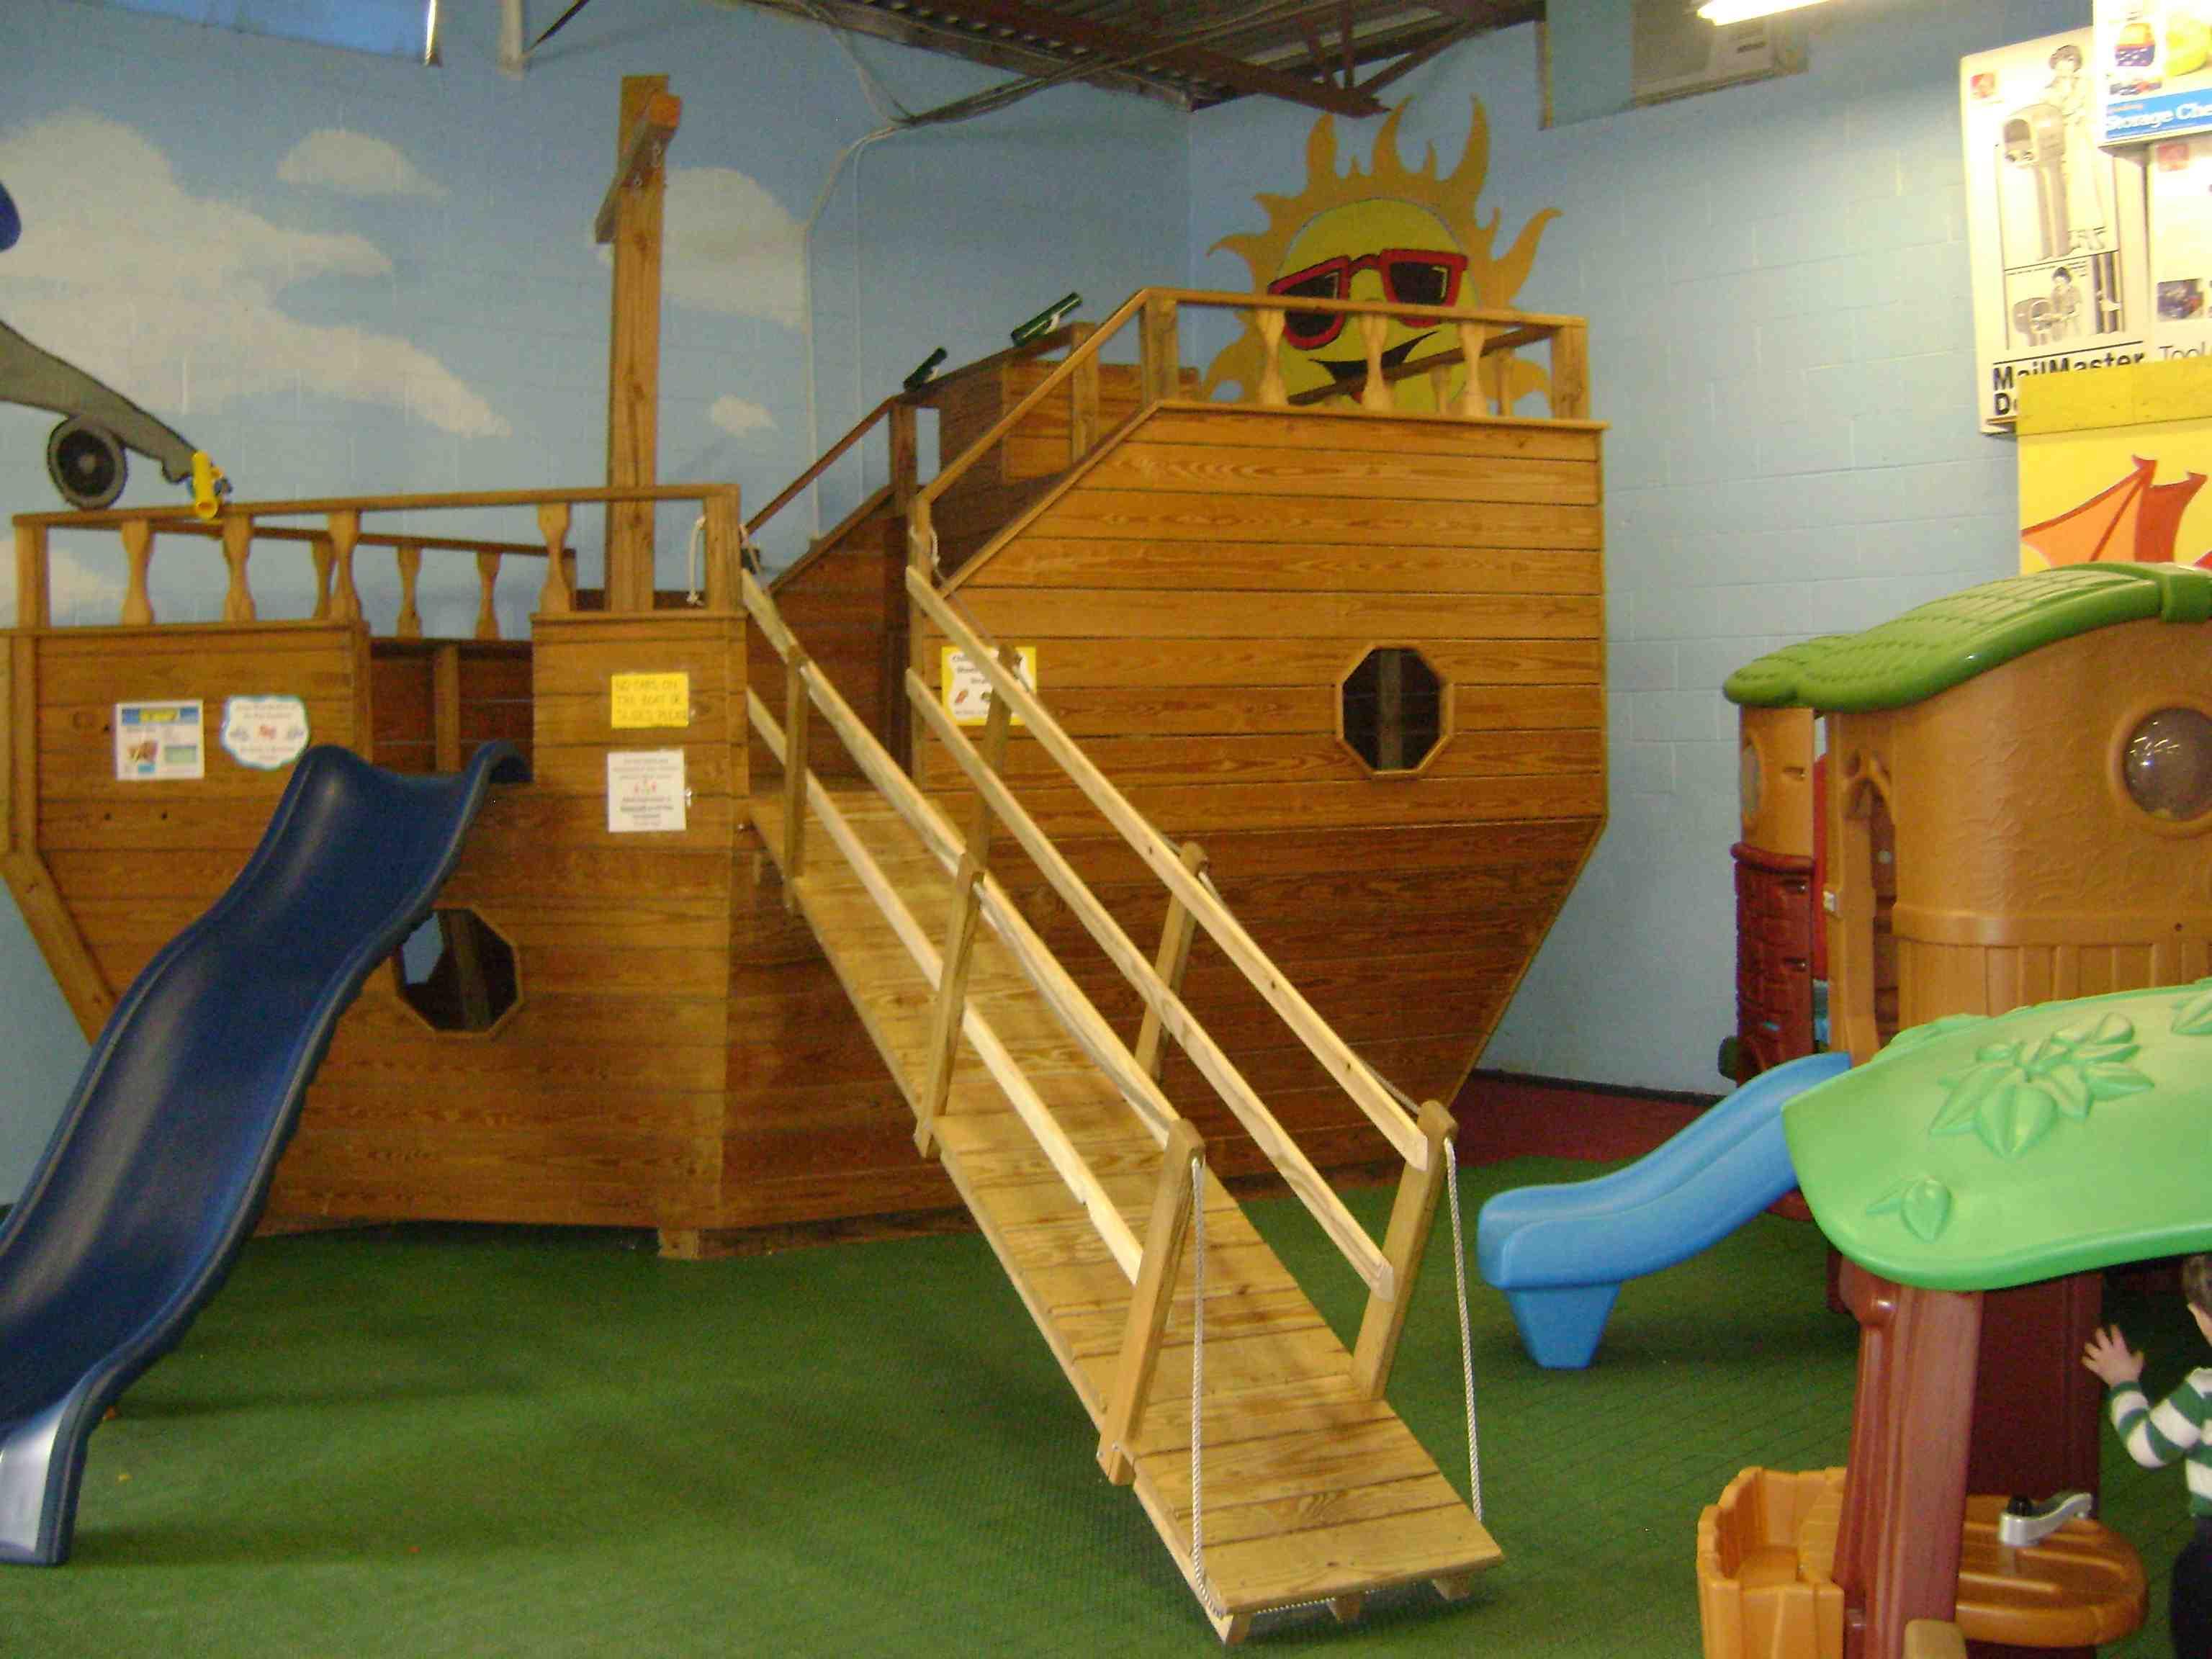 Outdoor fun indoors at timbergyms - Wooden pirate ship outdoor ...